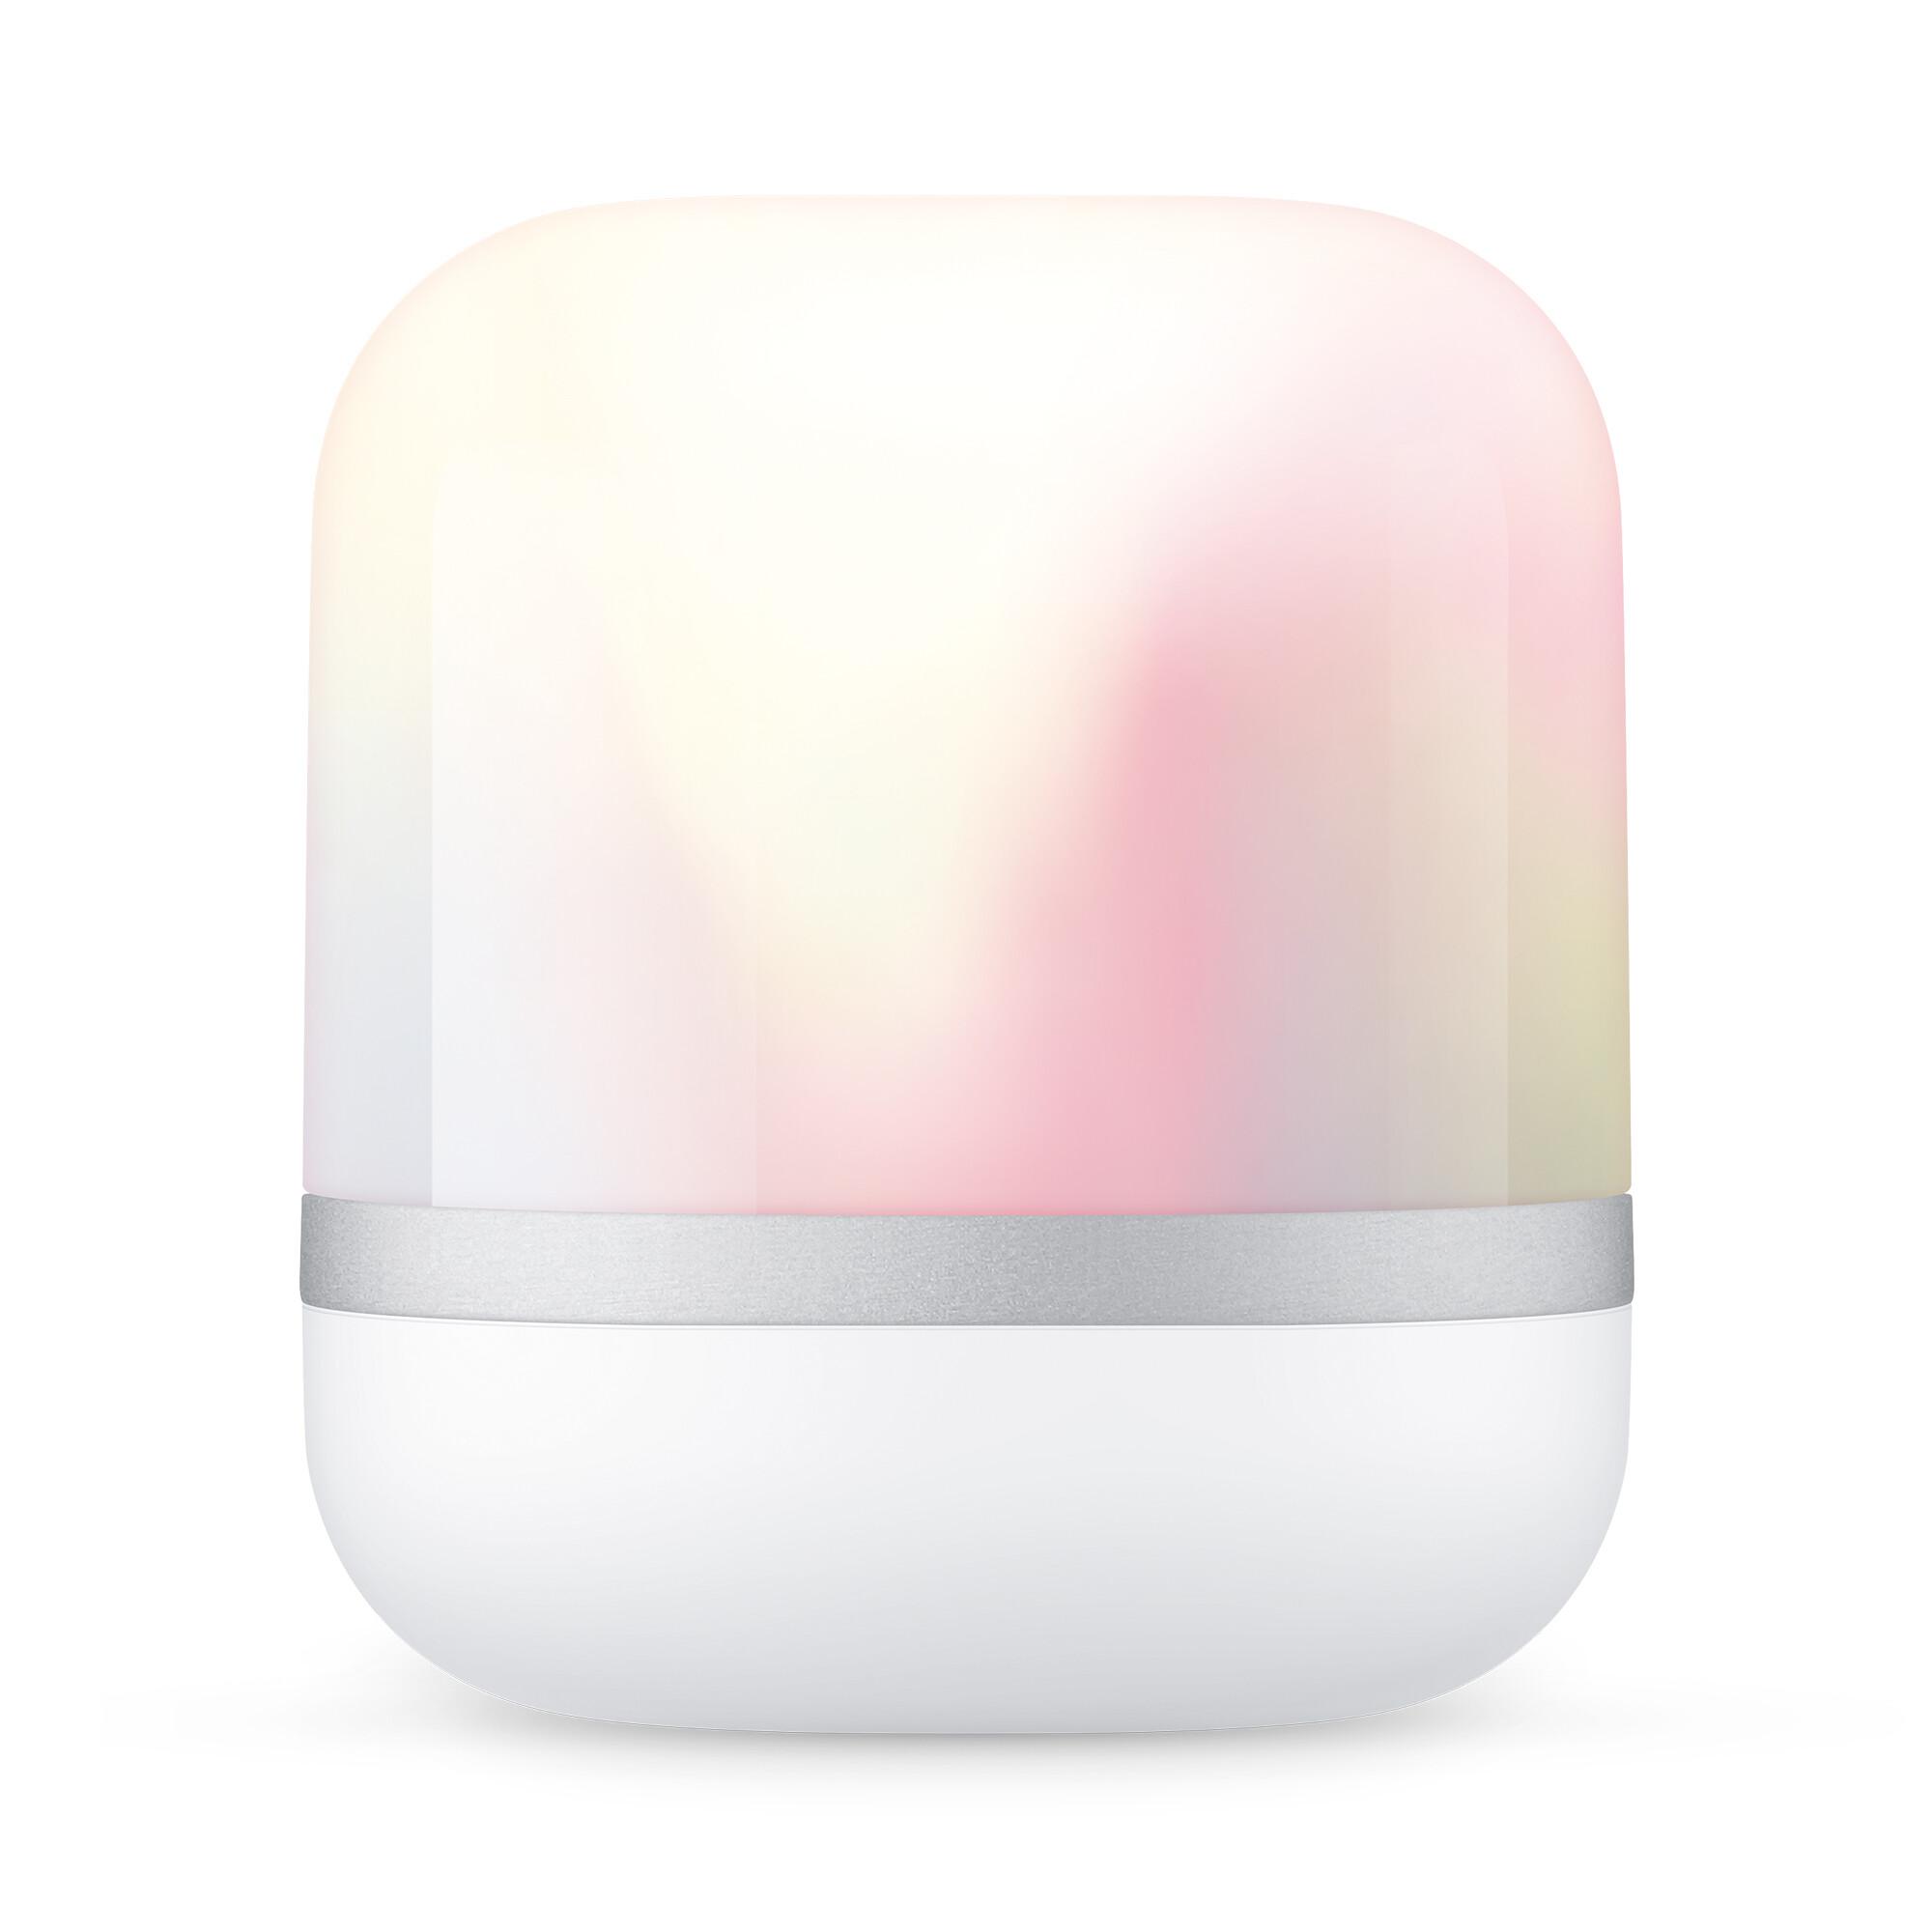 WiZ Tafellamp 1x13W Vierkant Wit